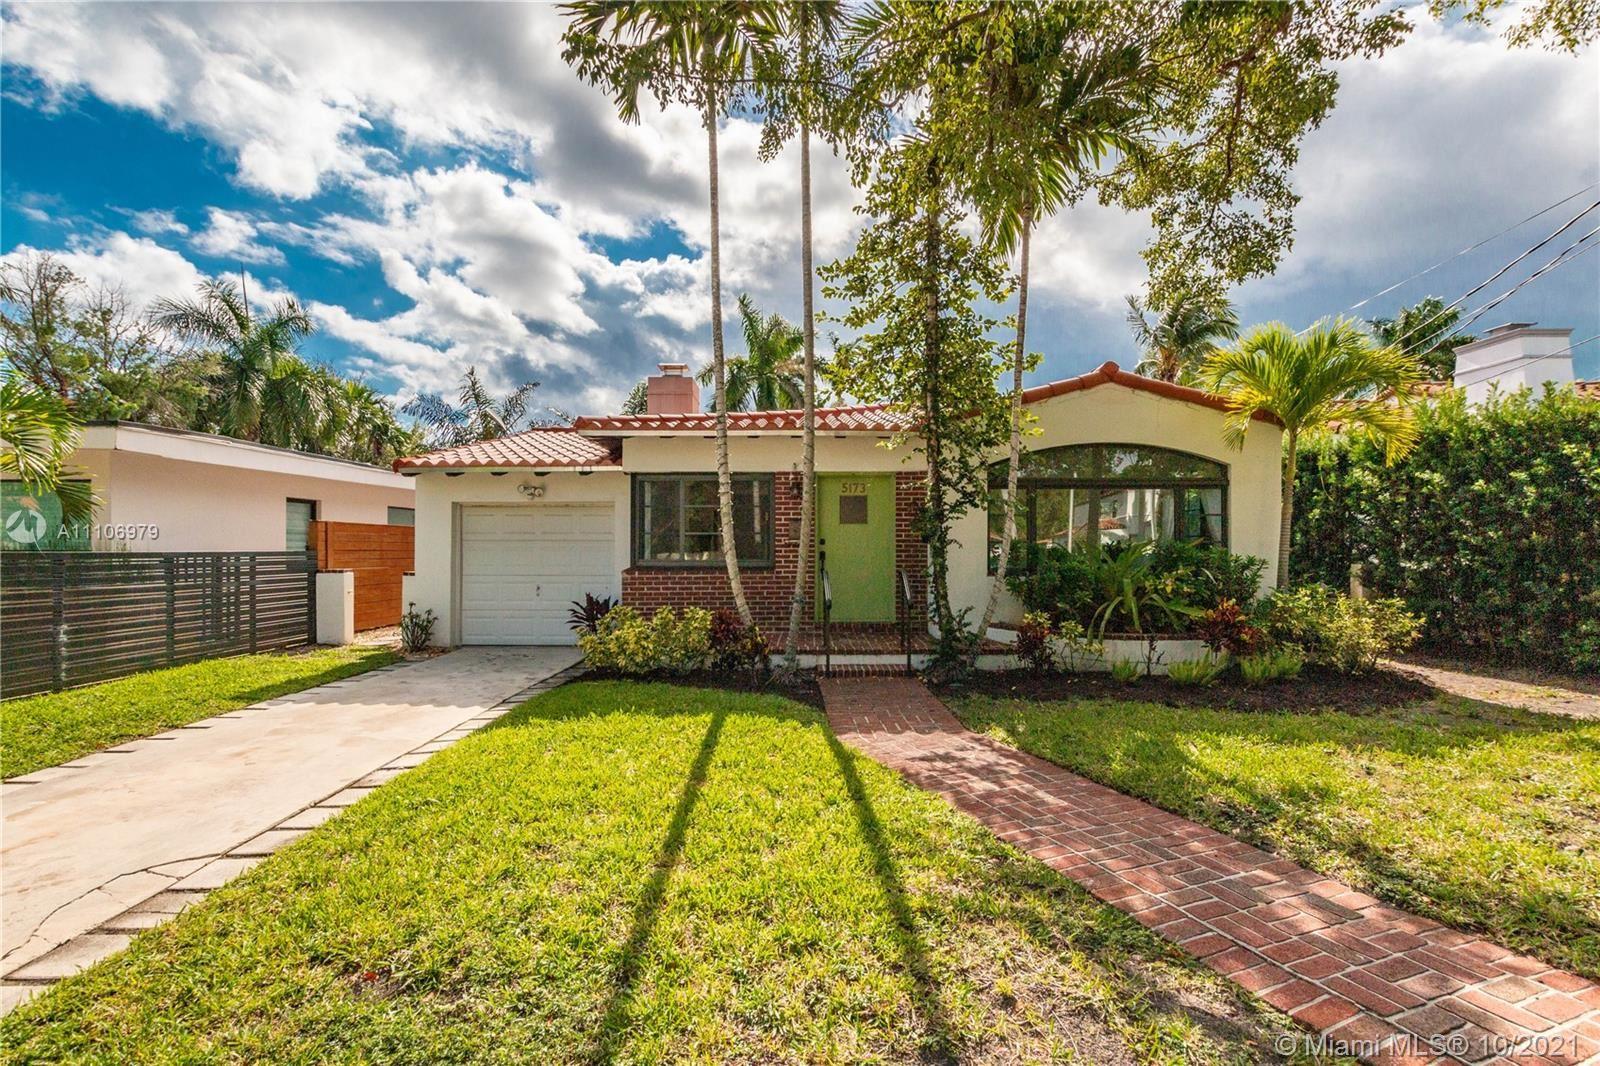 Photo of 5173 Alton Rd, Miami Beach, FL 33140 (MLS # A11106979)